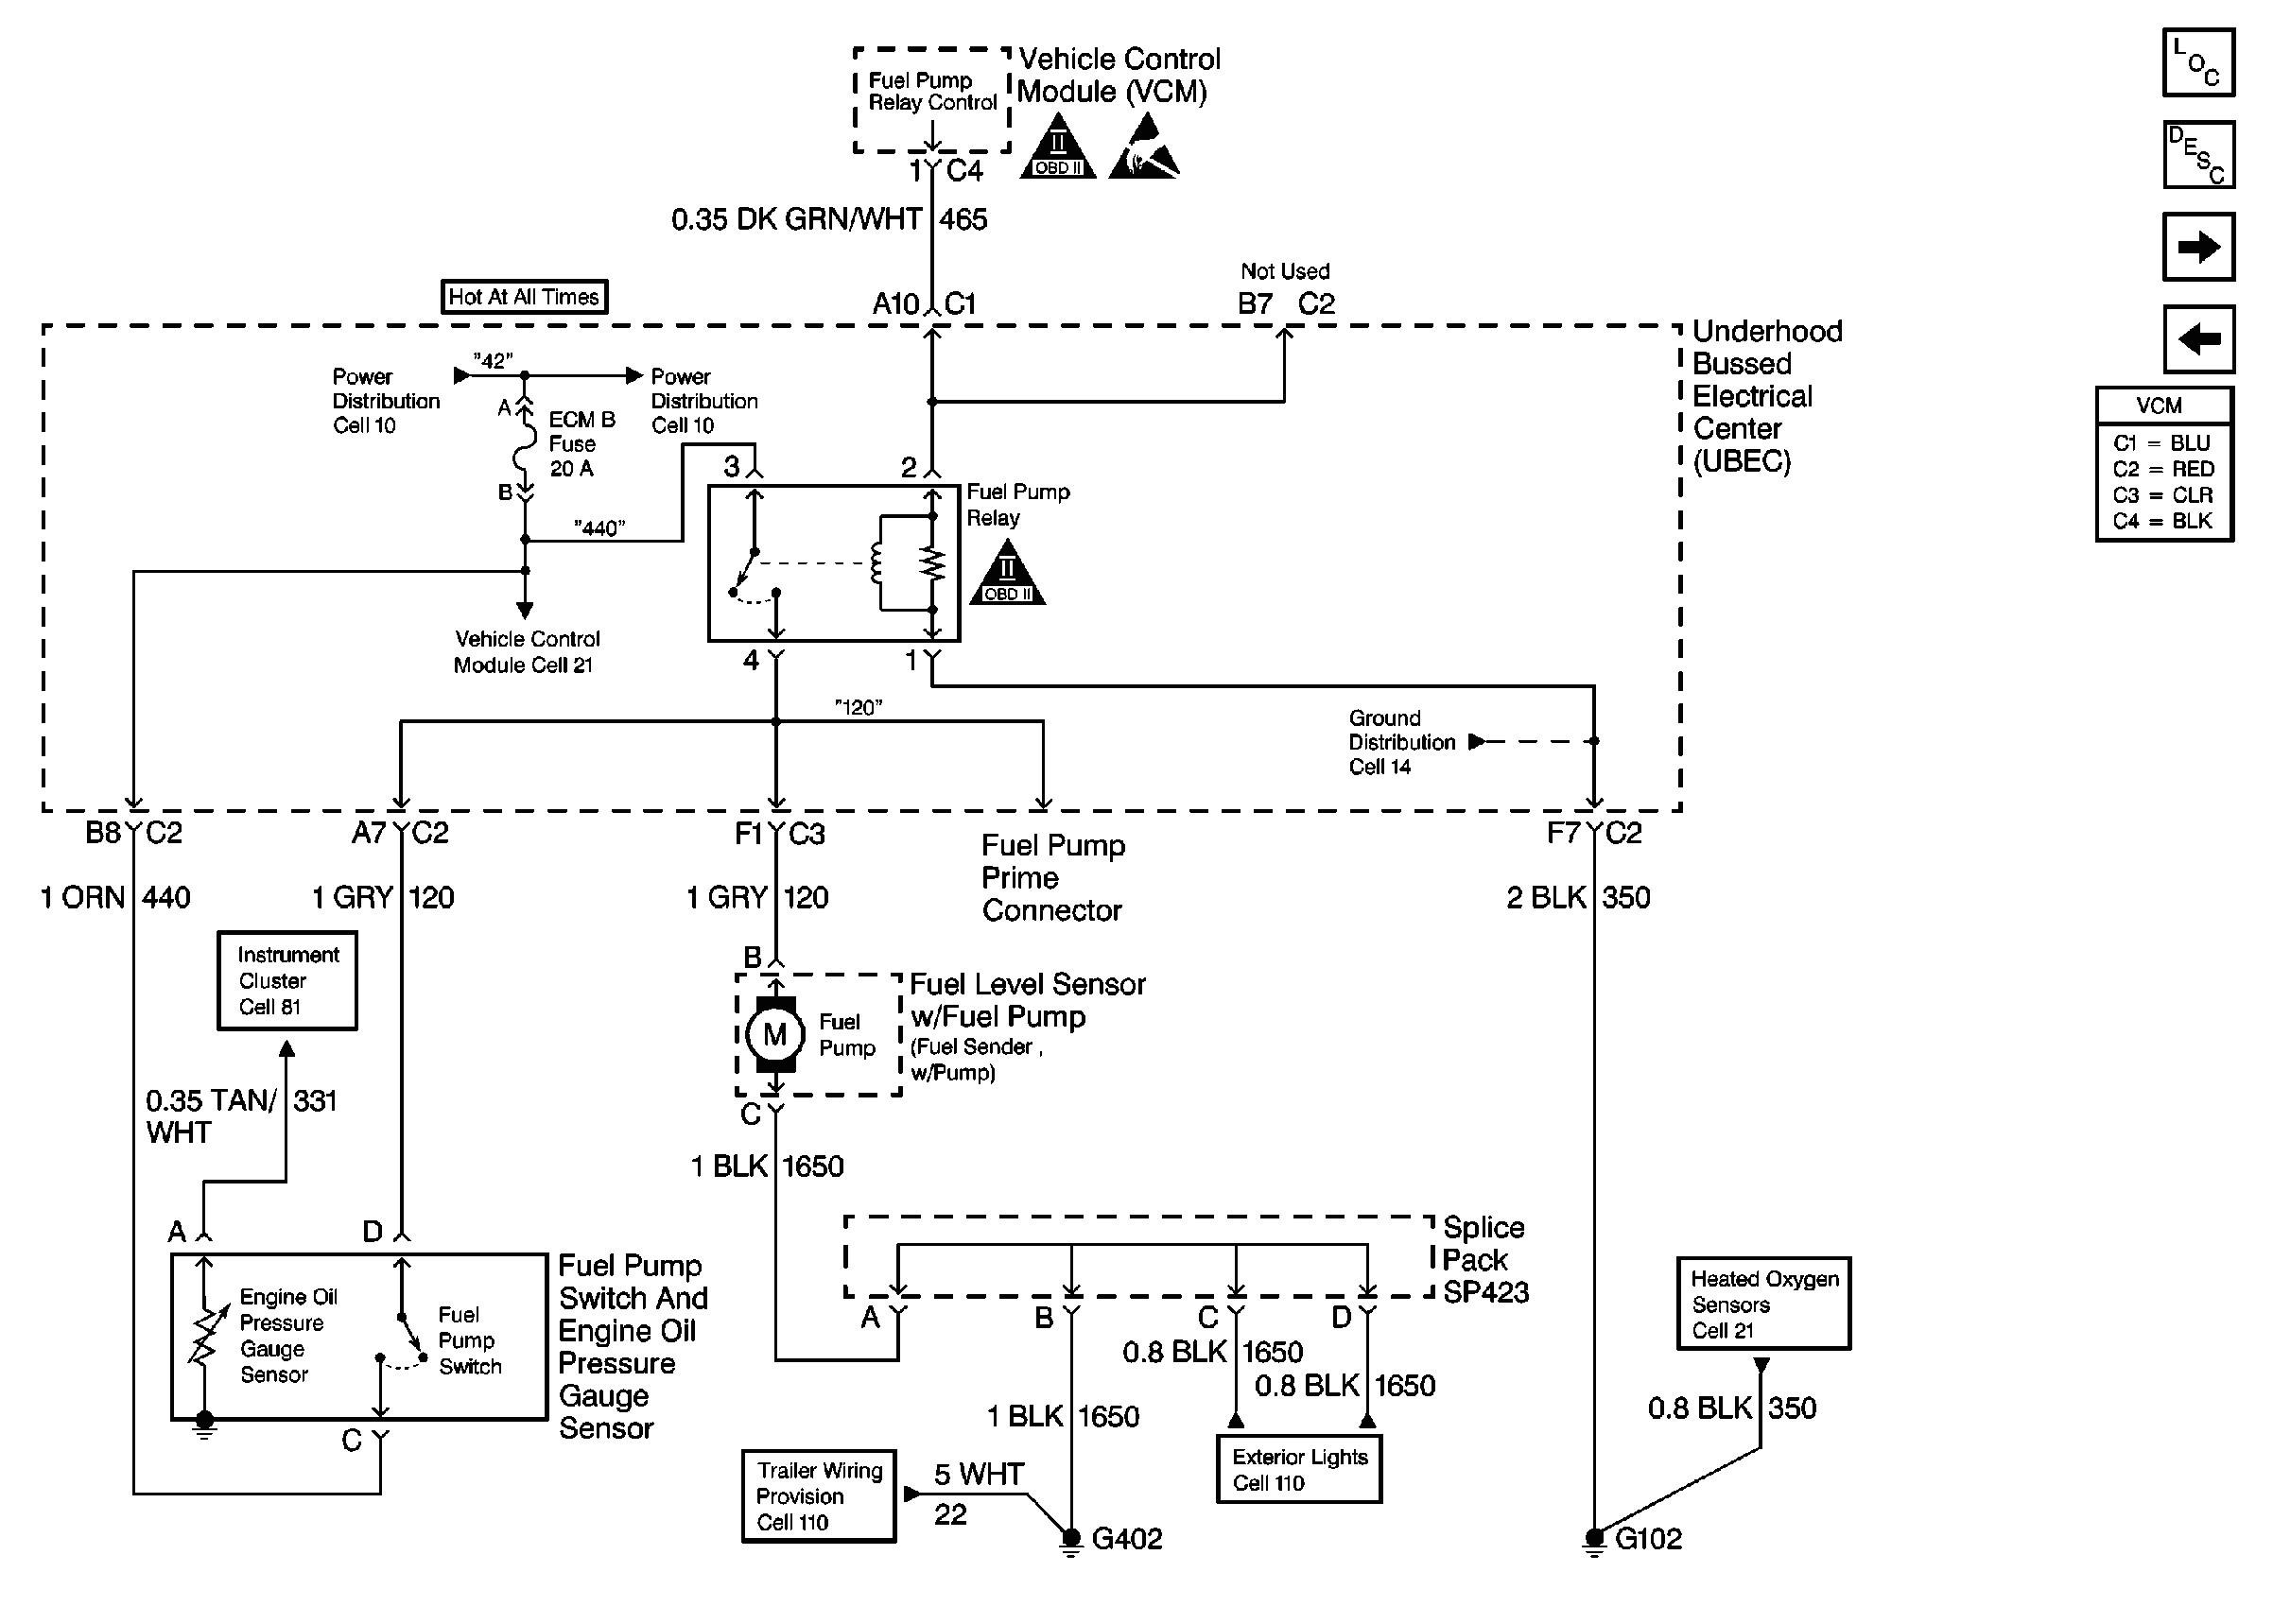 2003 trailblazer fuel pump wiring diagram chevy tahoe with basic pictures modern day print chevrolet schemes